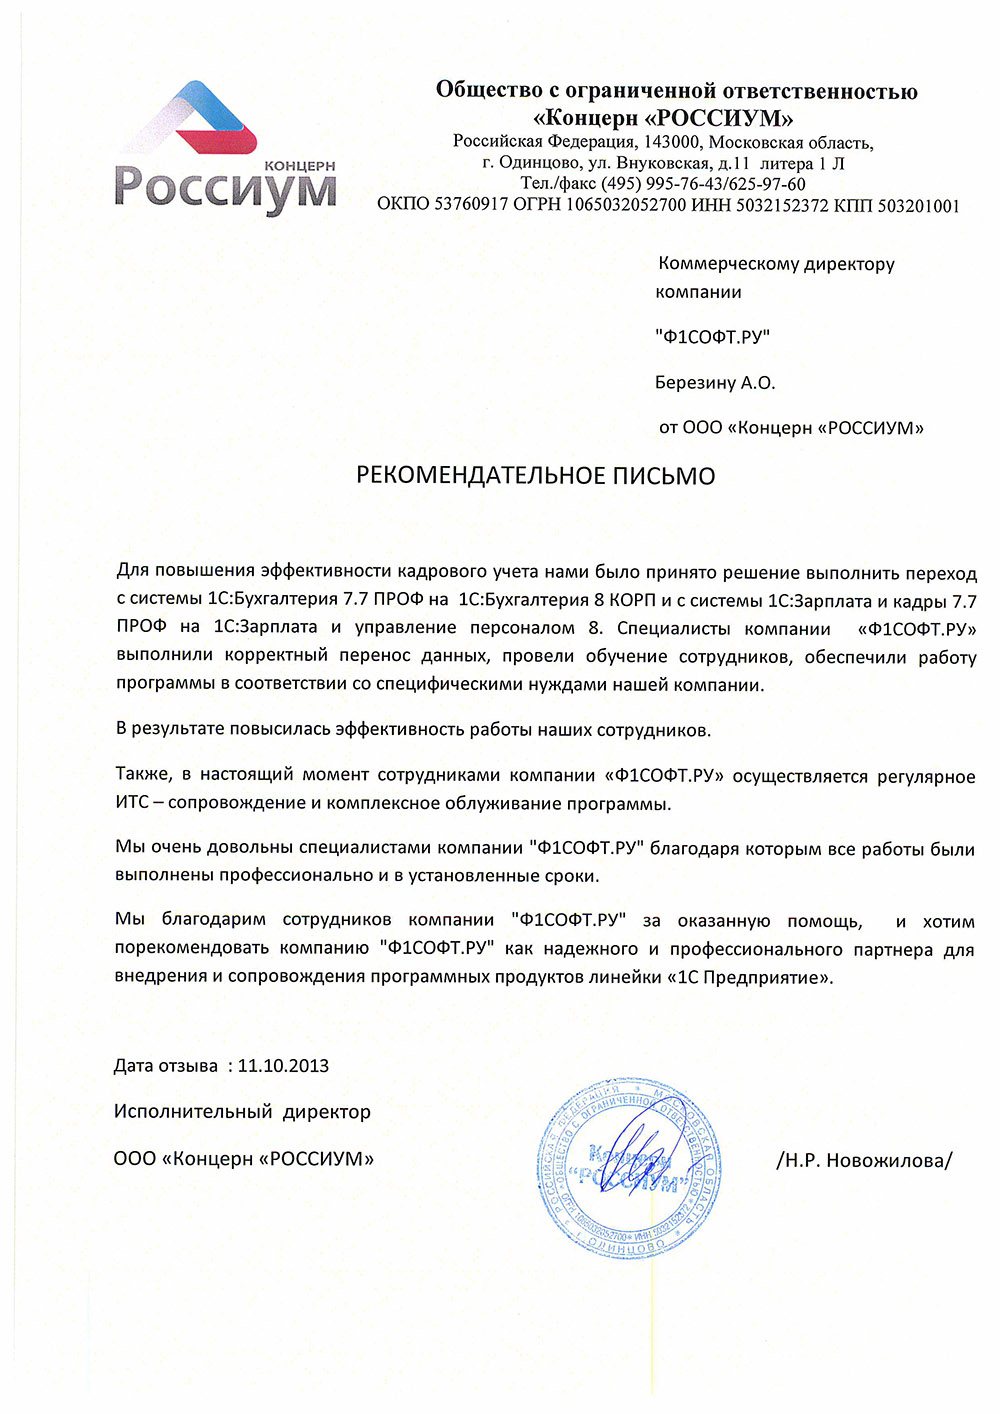 Концерн Россиум, отзыв клиента